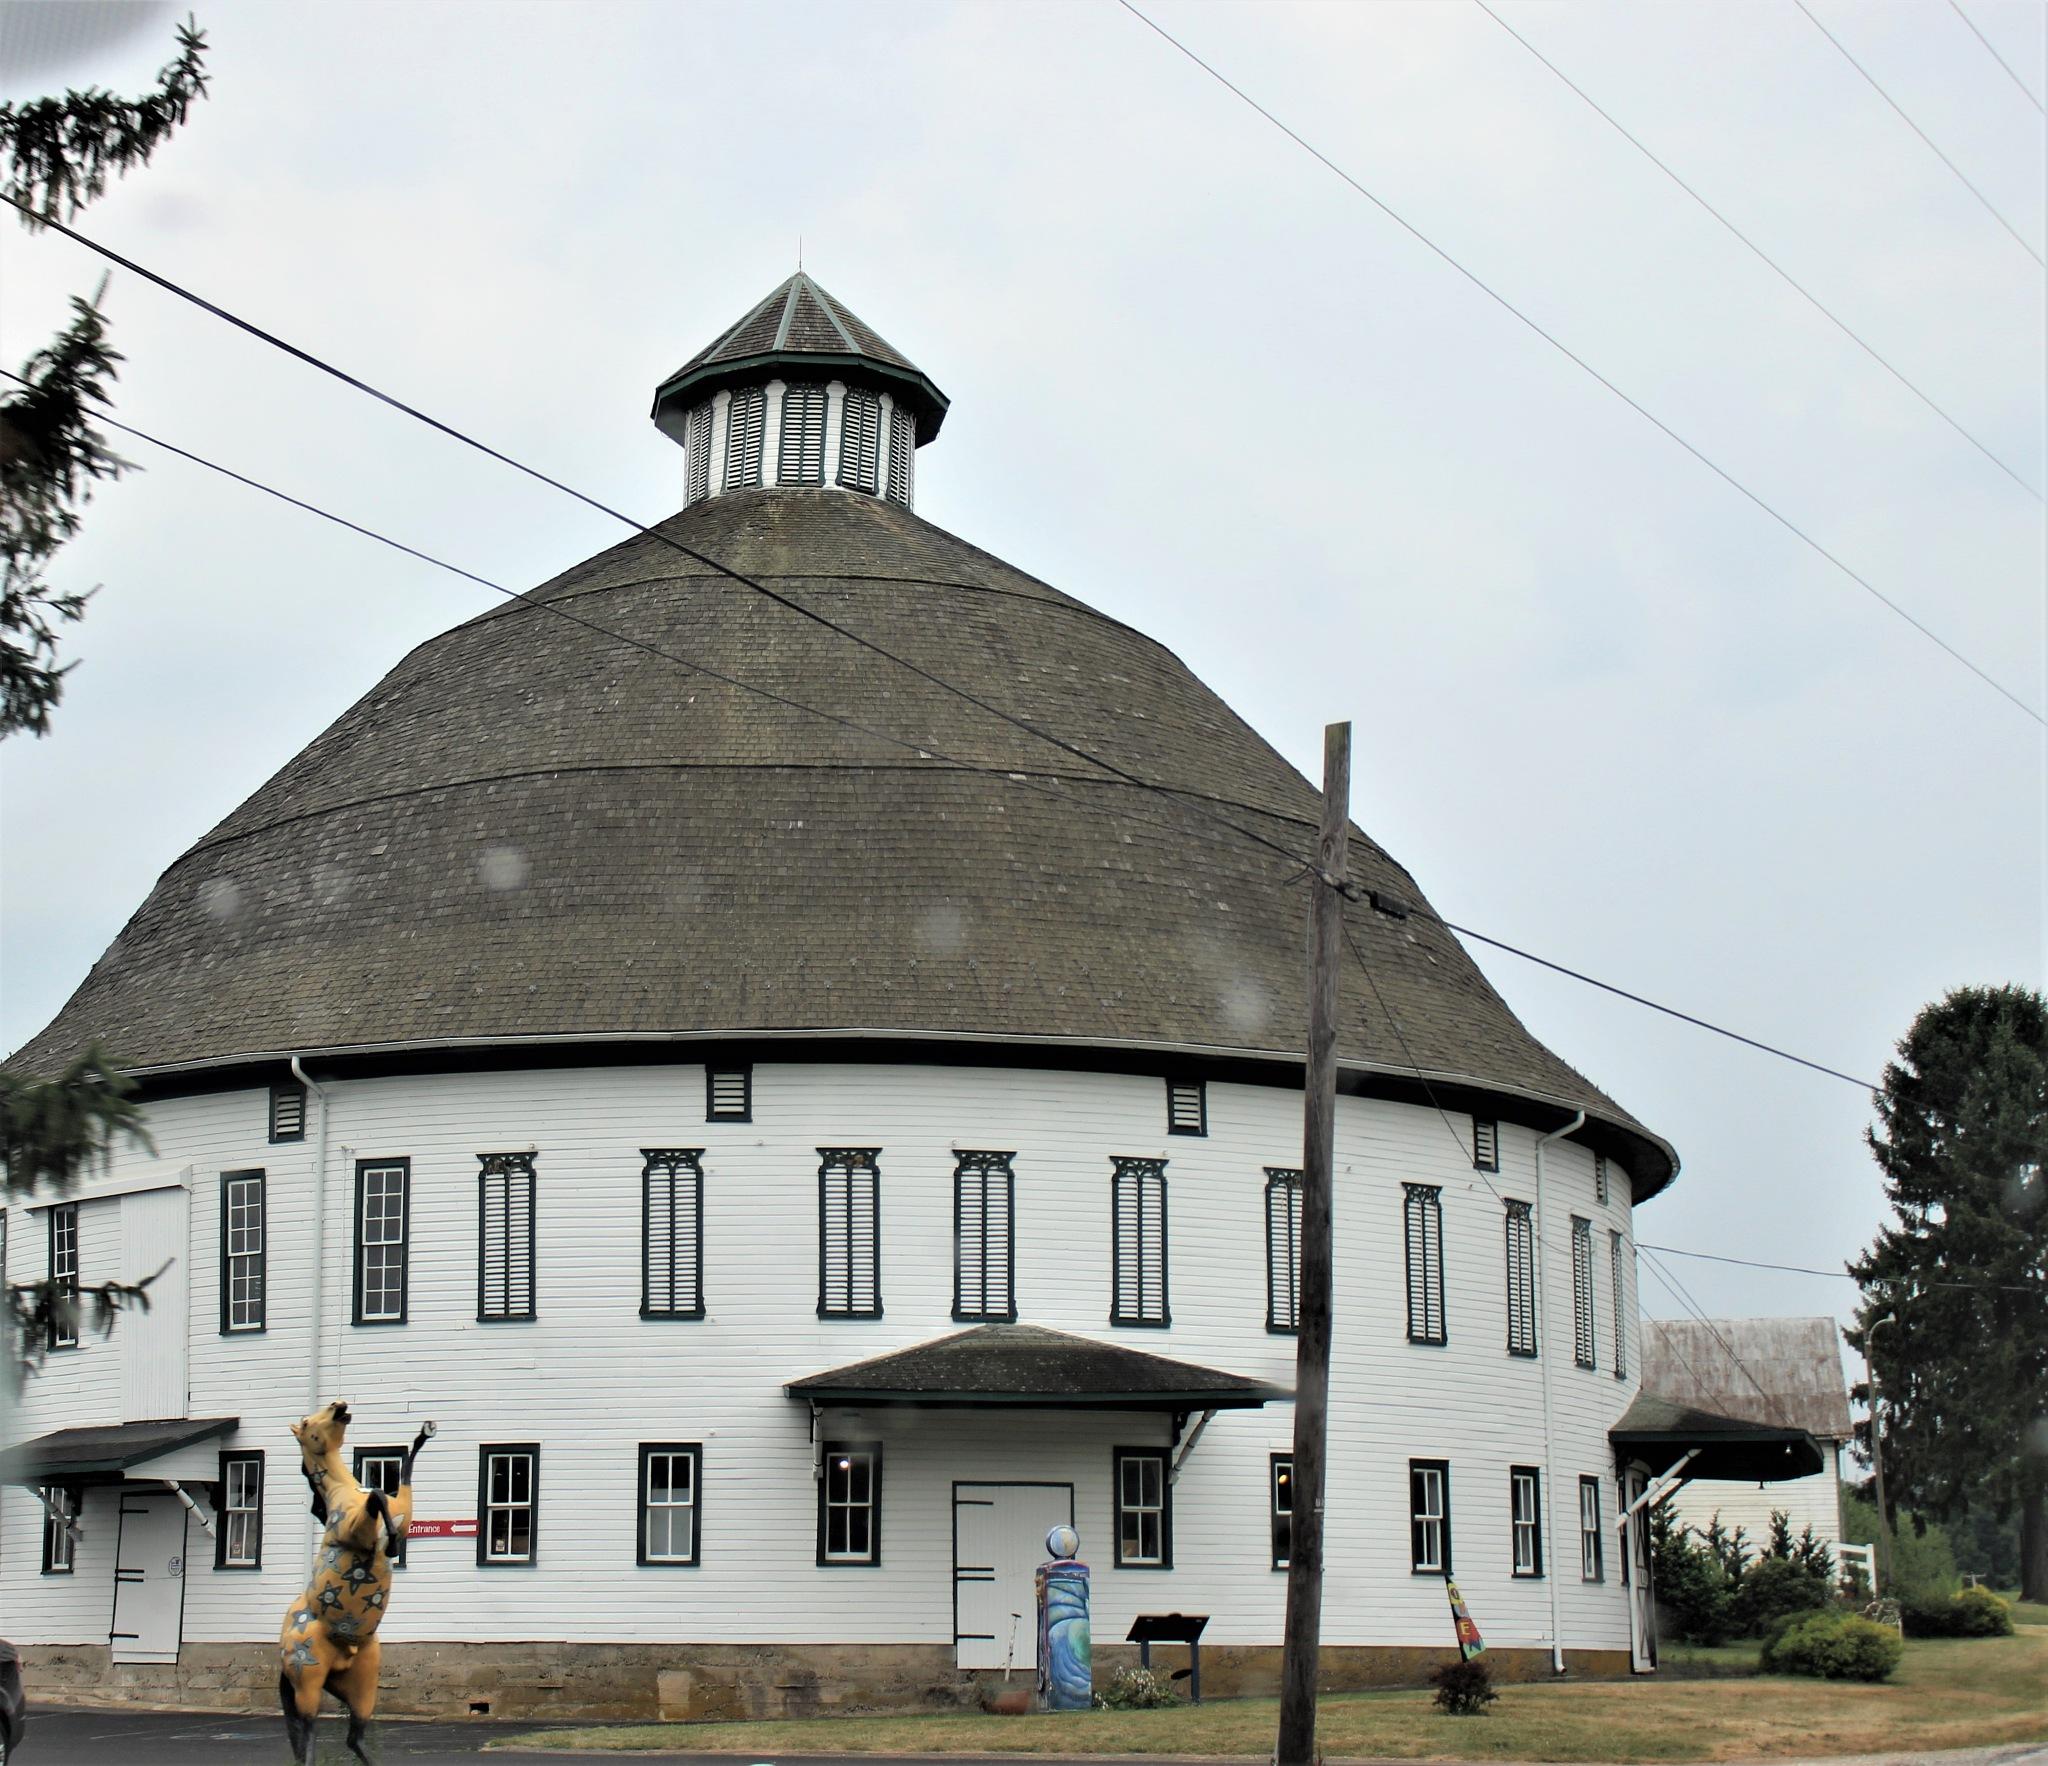 The Round Barn by RichandCheryl